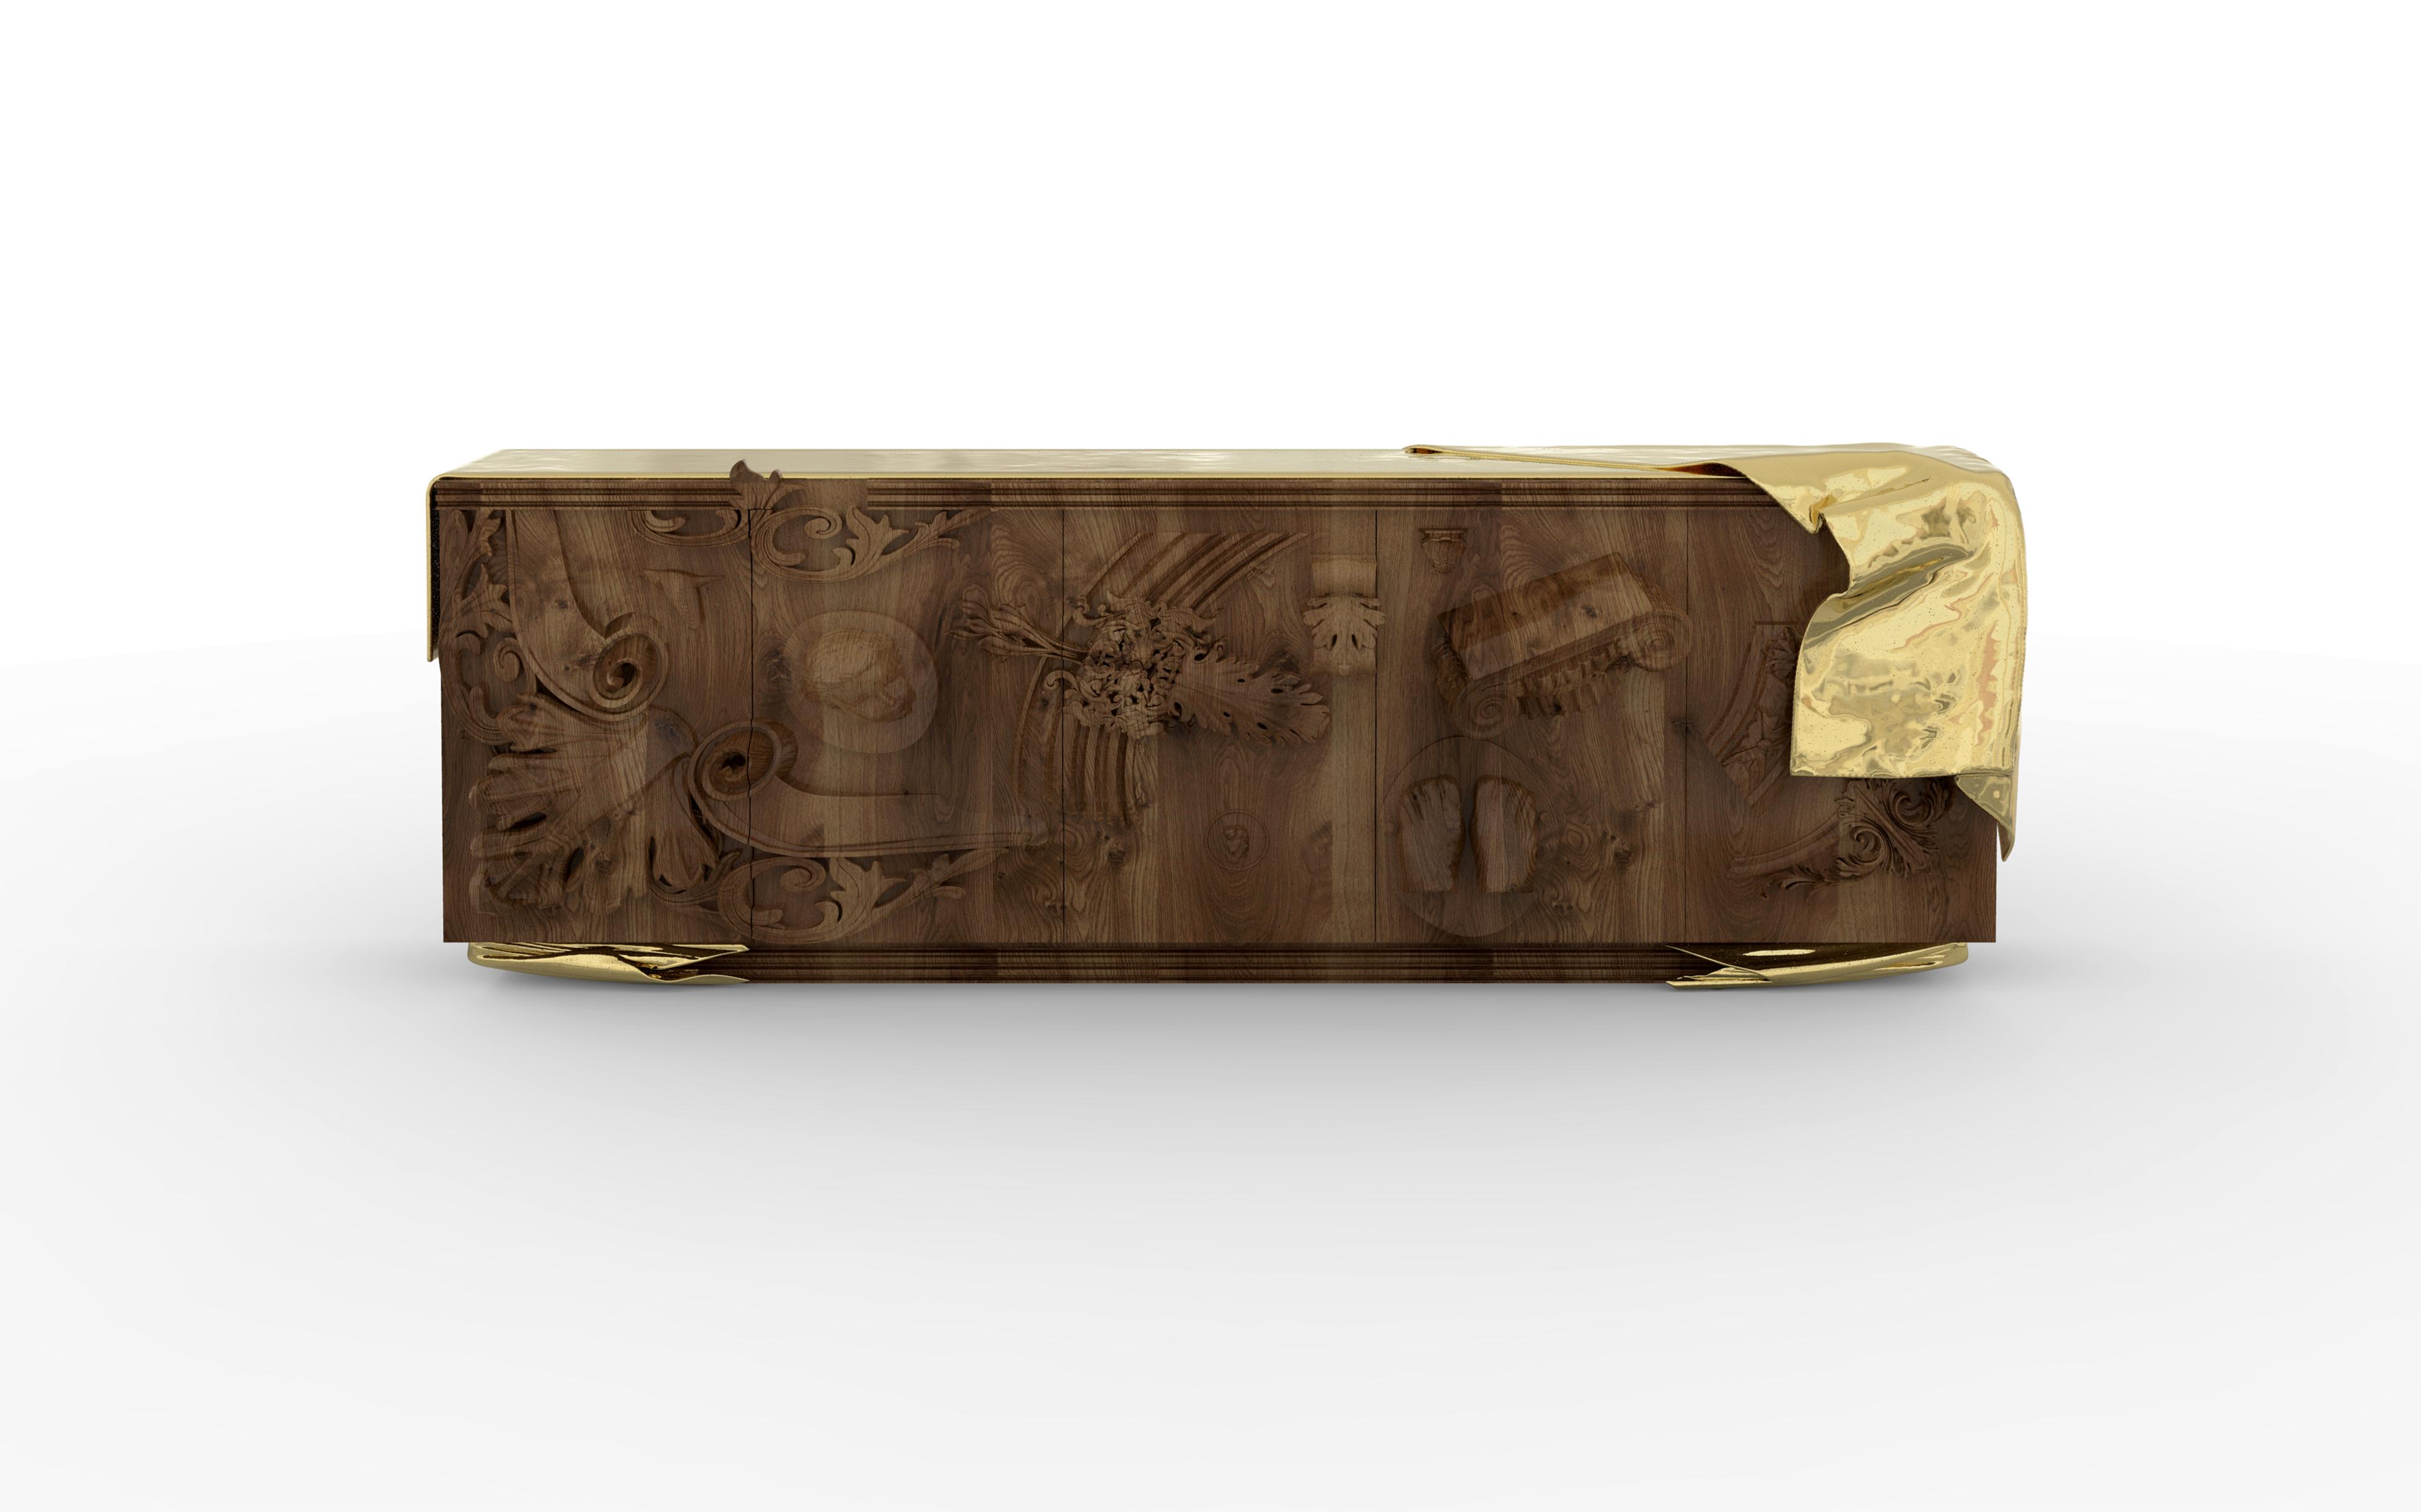 Furniture Design Debuts You Would've Discovered At Salone del Mobile (10) furniture design Furniture Design Debuts You Would've Discovered At Salone del Mobile Furniture Design Debuts You Wouldve Discovered At Salone del Mobile 10